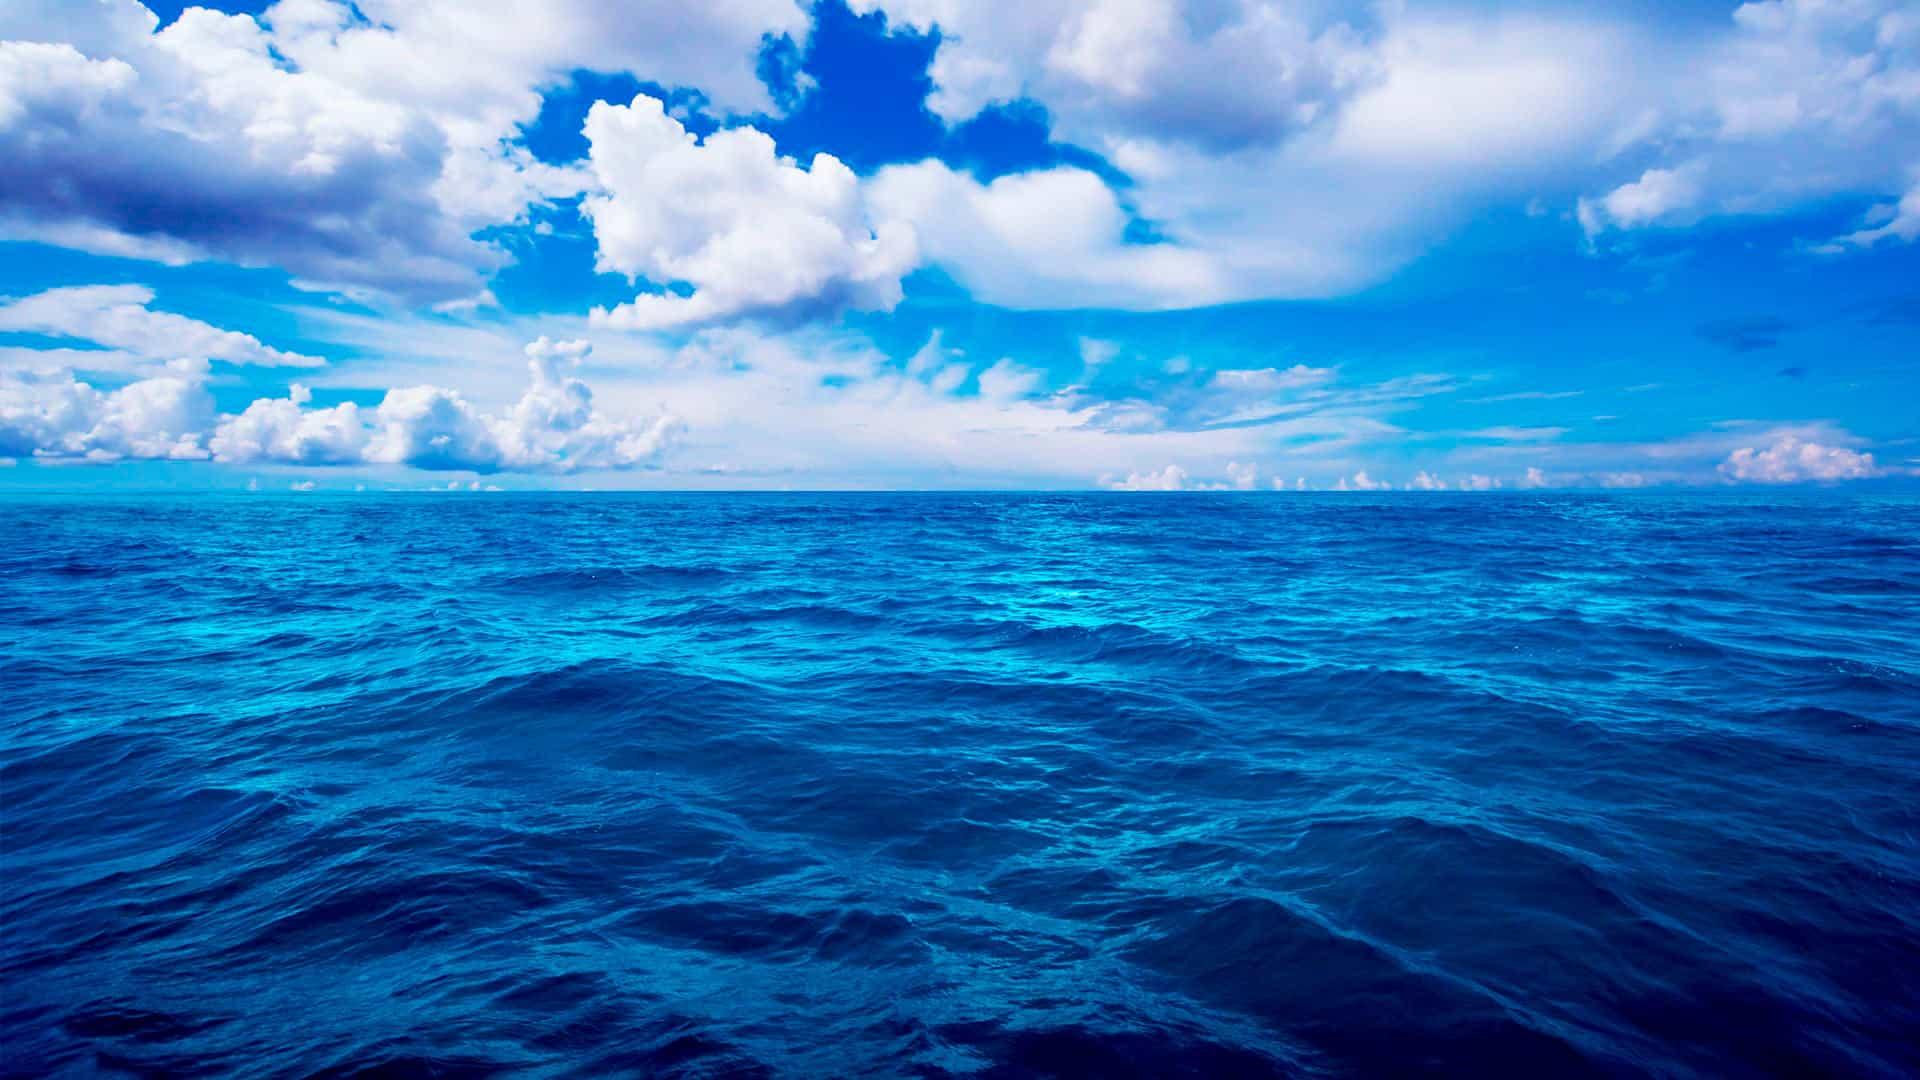 Влияние сна про море на жизнь увидевшего — толкование по сонникам